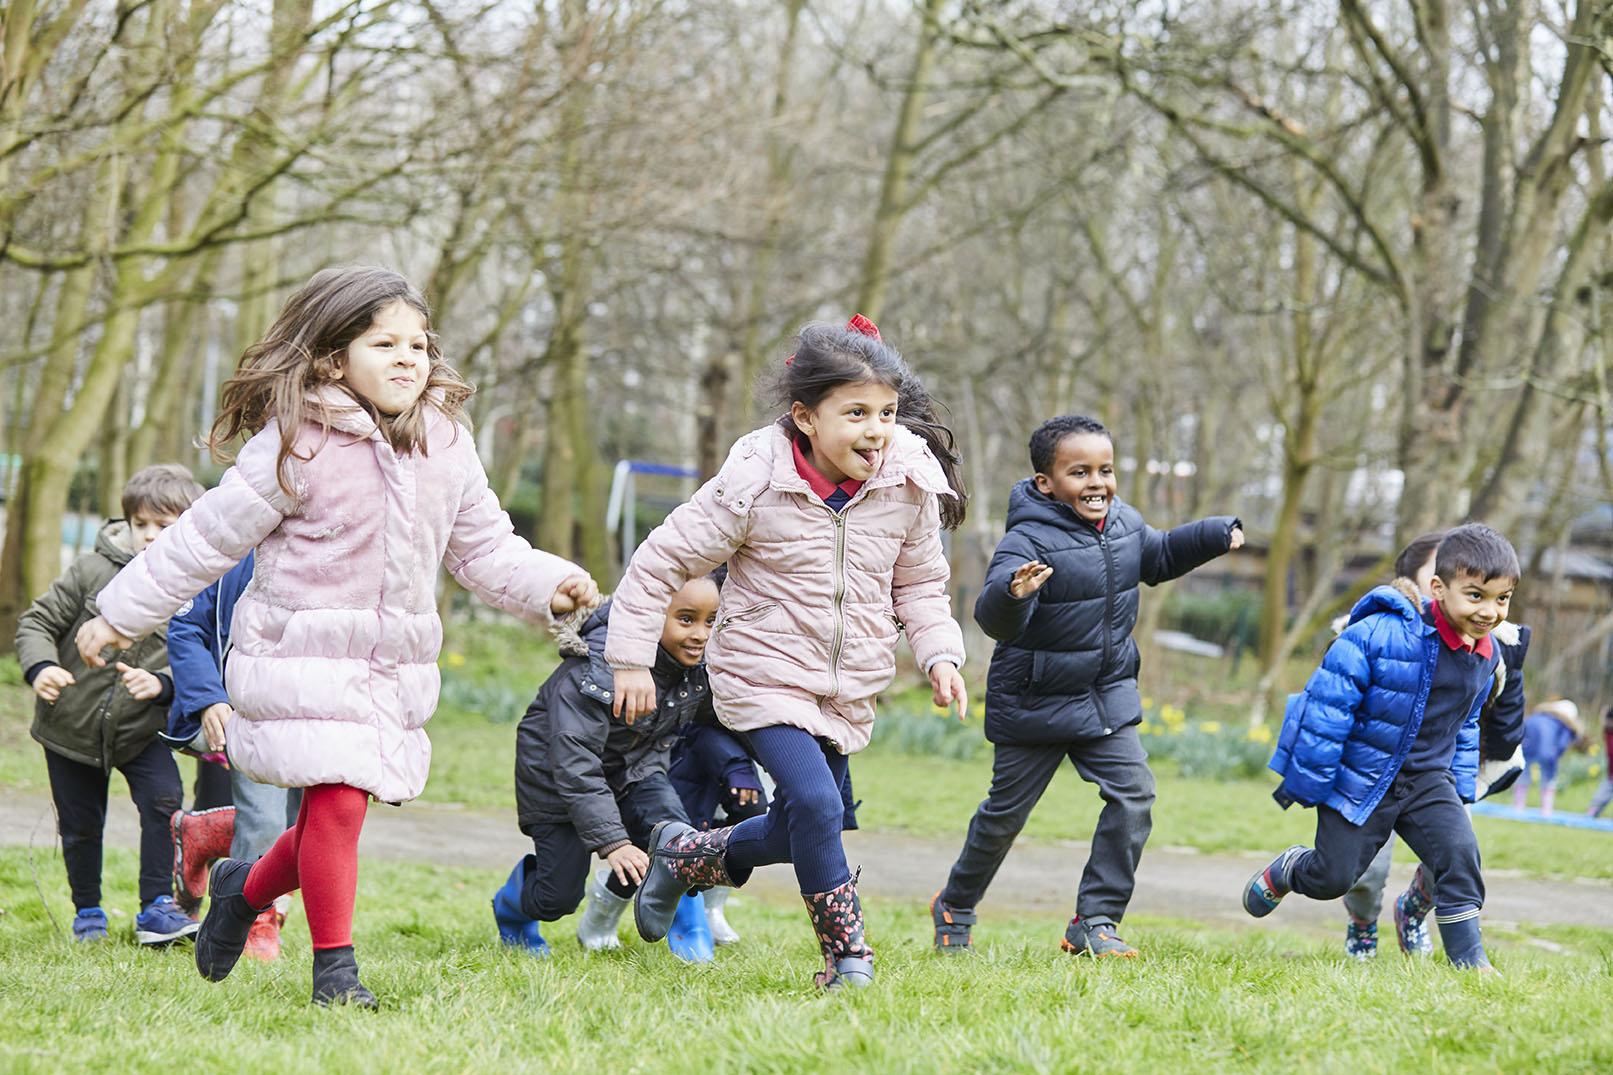 kids running Ks1